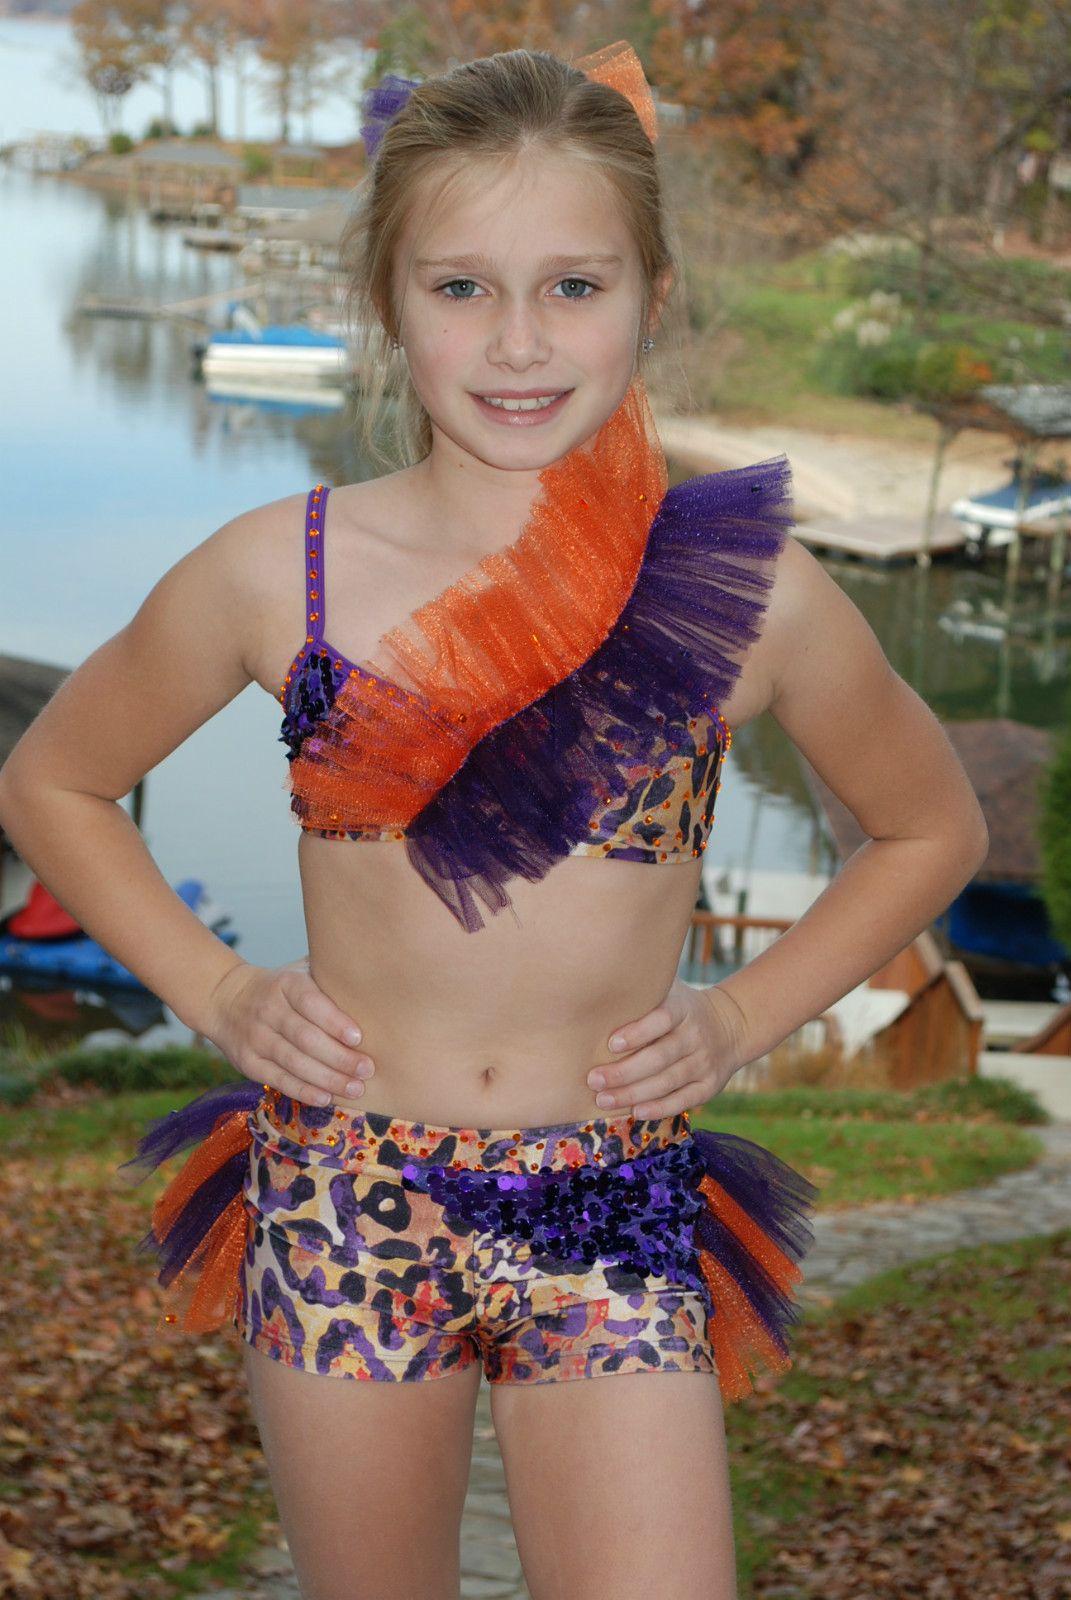 e2a3abd200a Purple Orange Leopard Print 2 PC Custom Competition Dance Costume CS cm CL